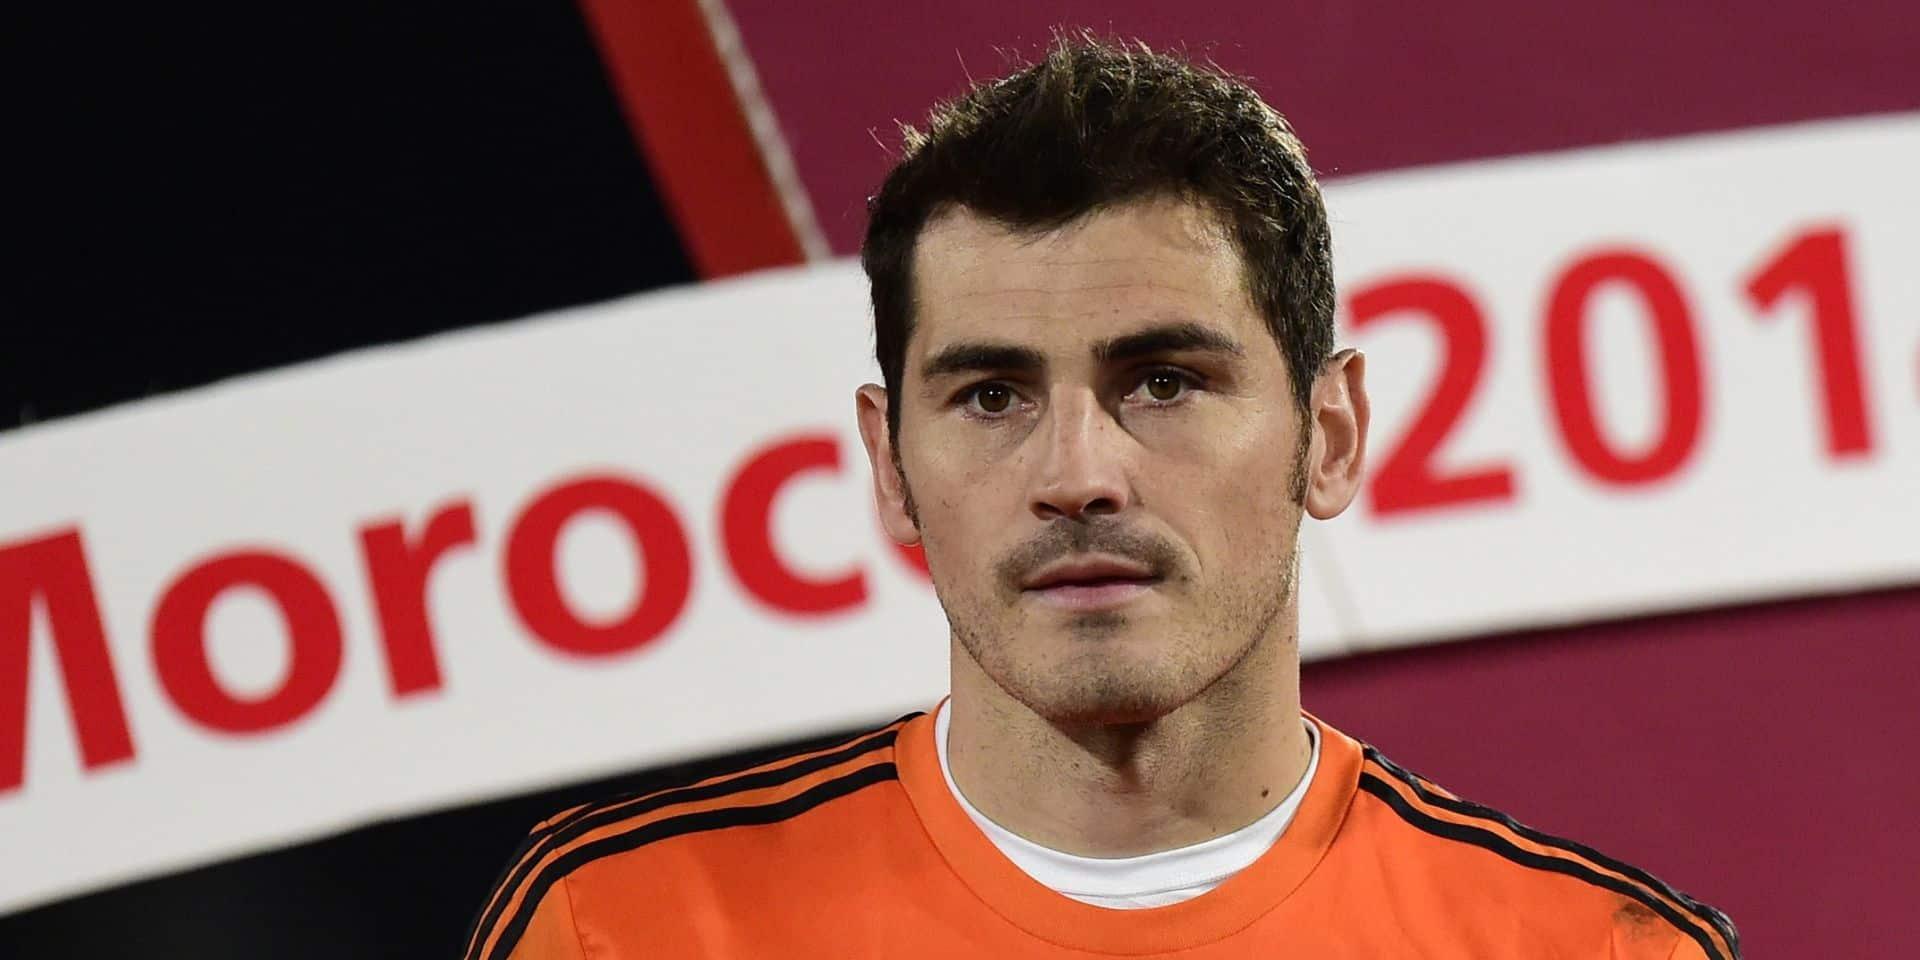 Iker Casillas aura marqué l'histoire du foot espagnol